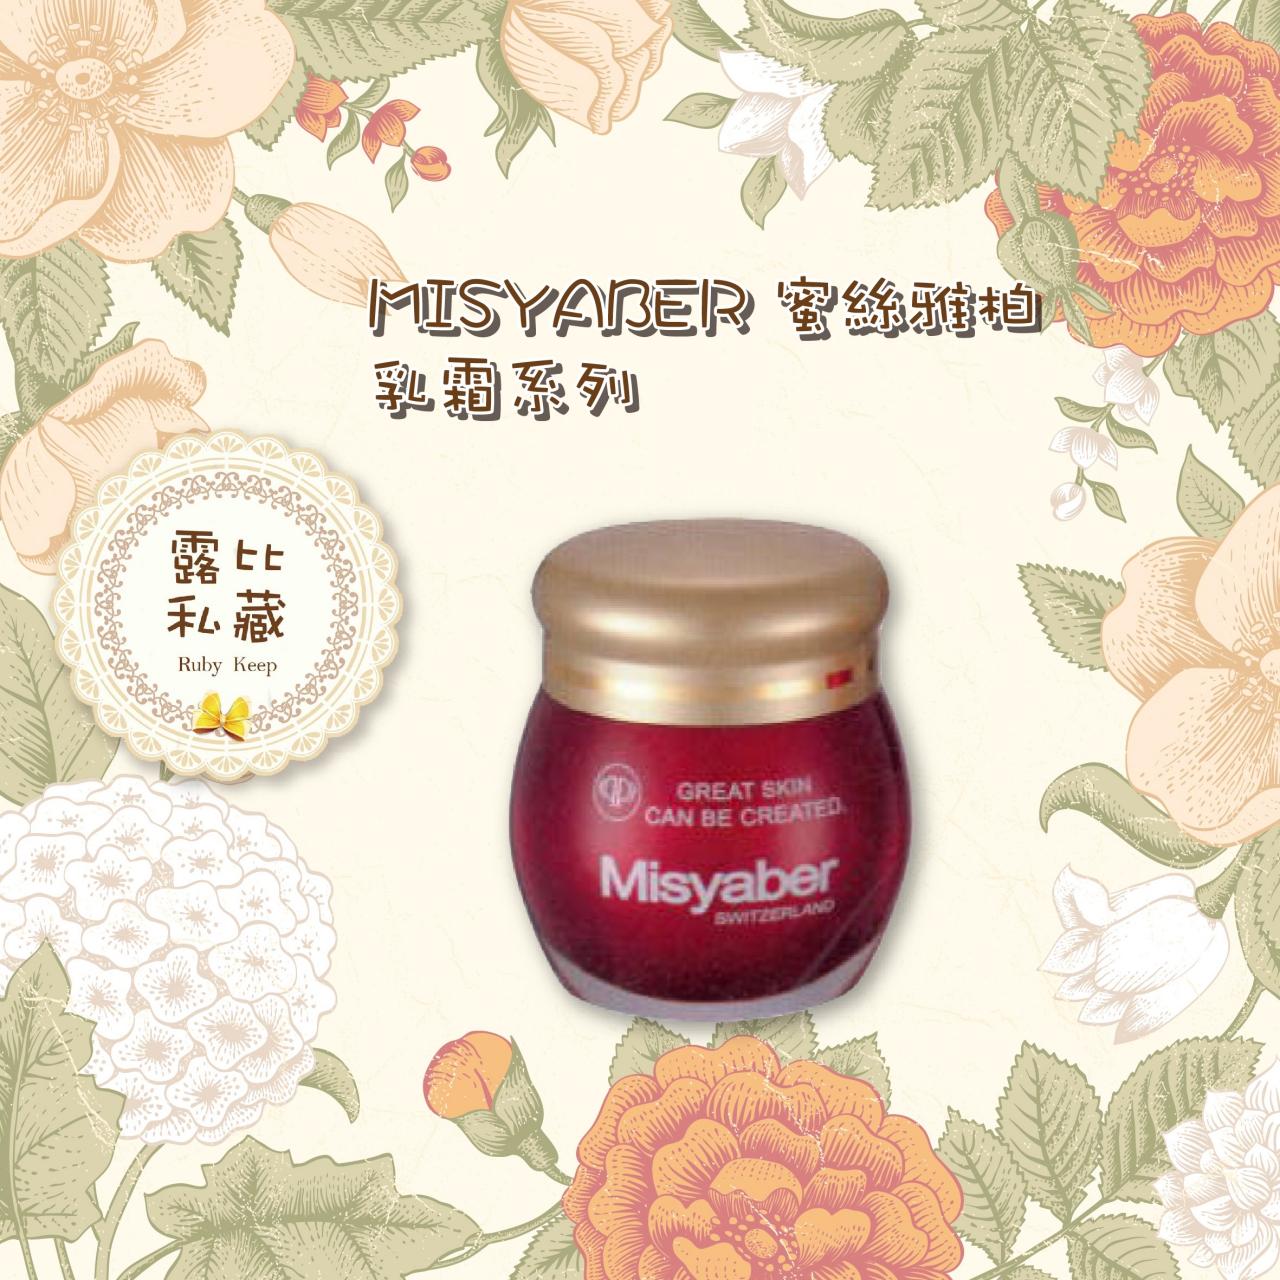 MISYABER 蜜絲雅柏 保養乳霜系列  50ML/30ML